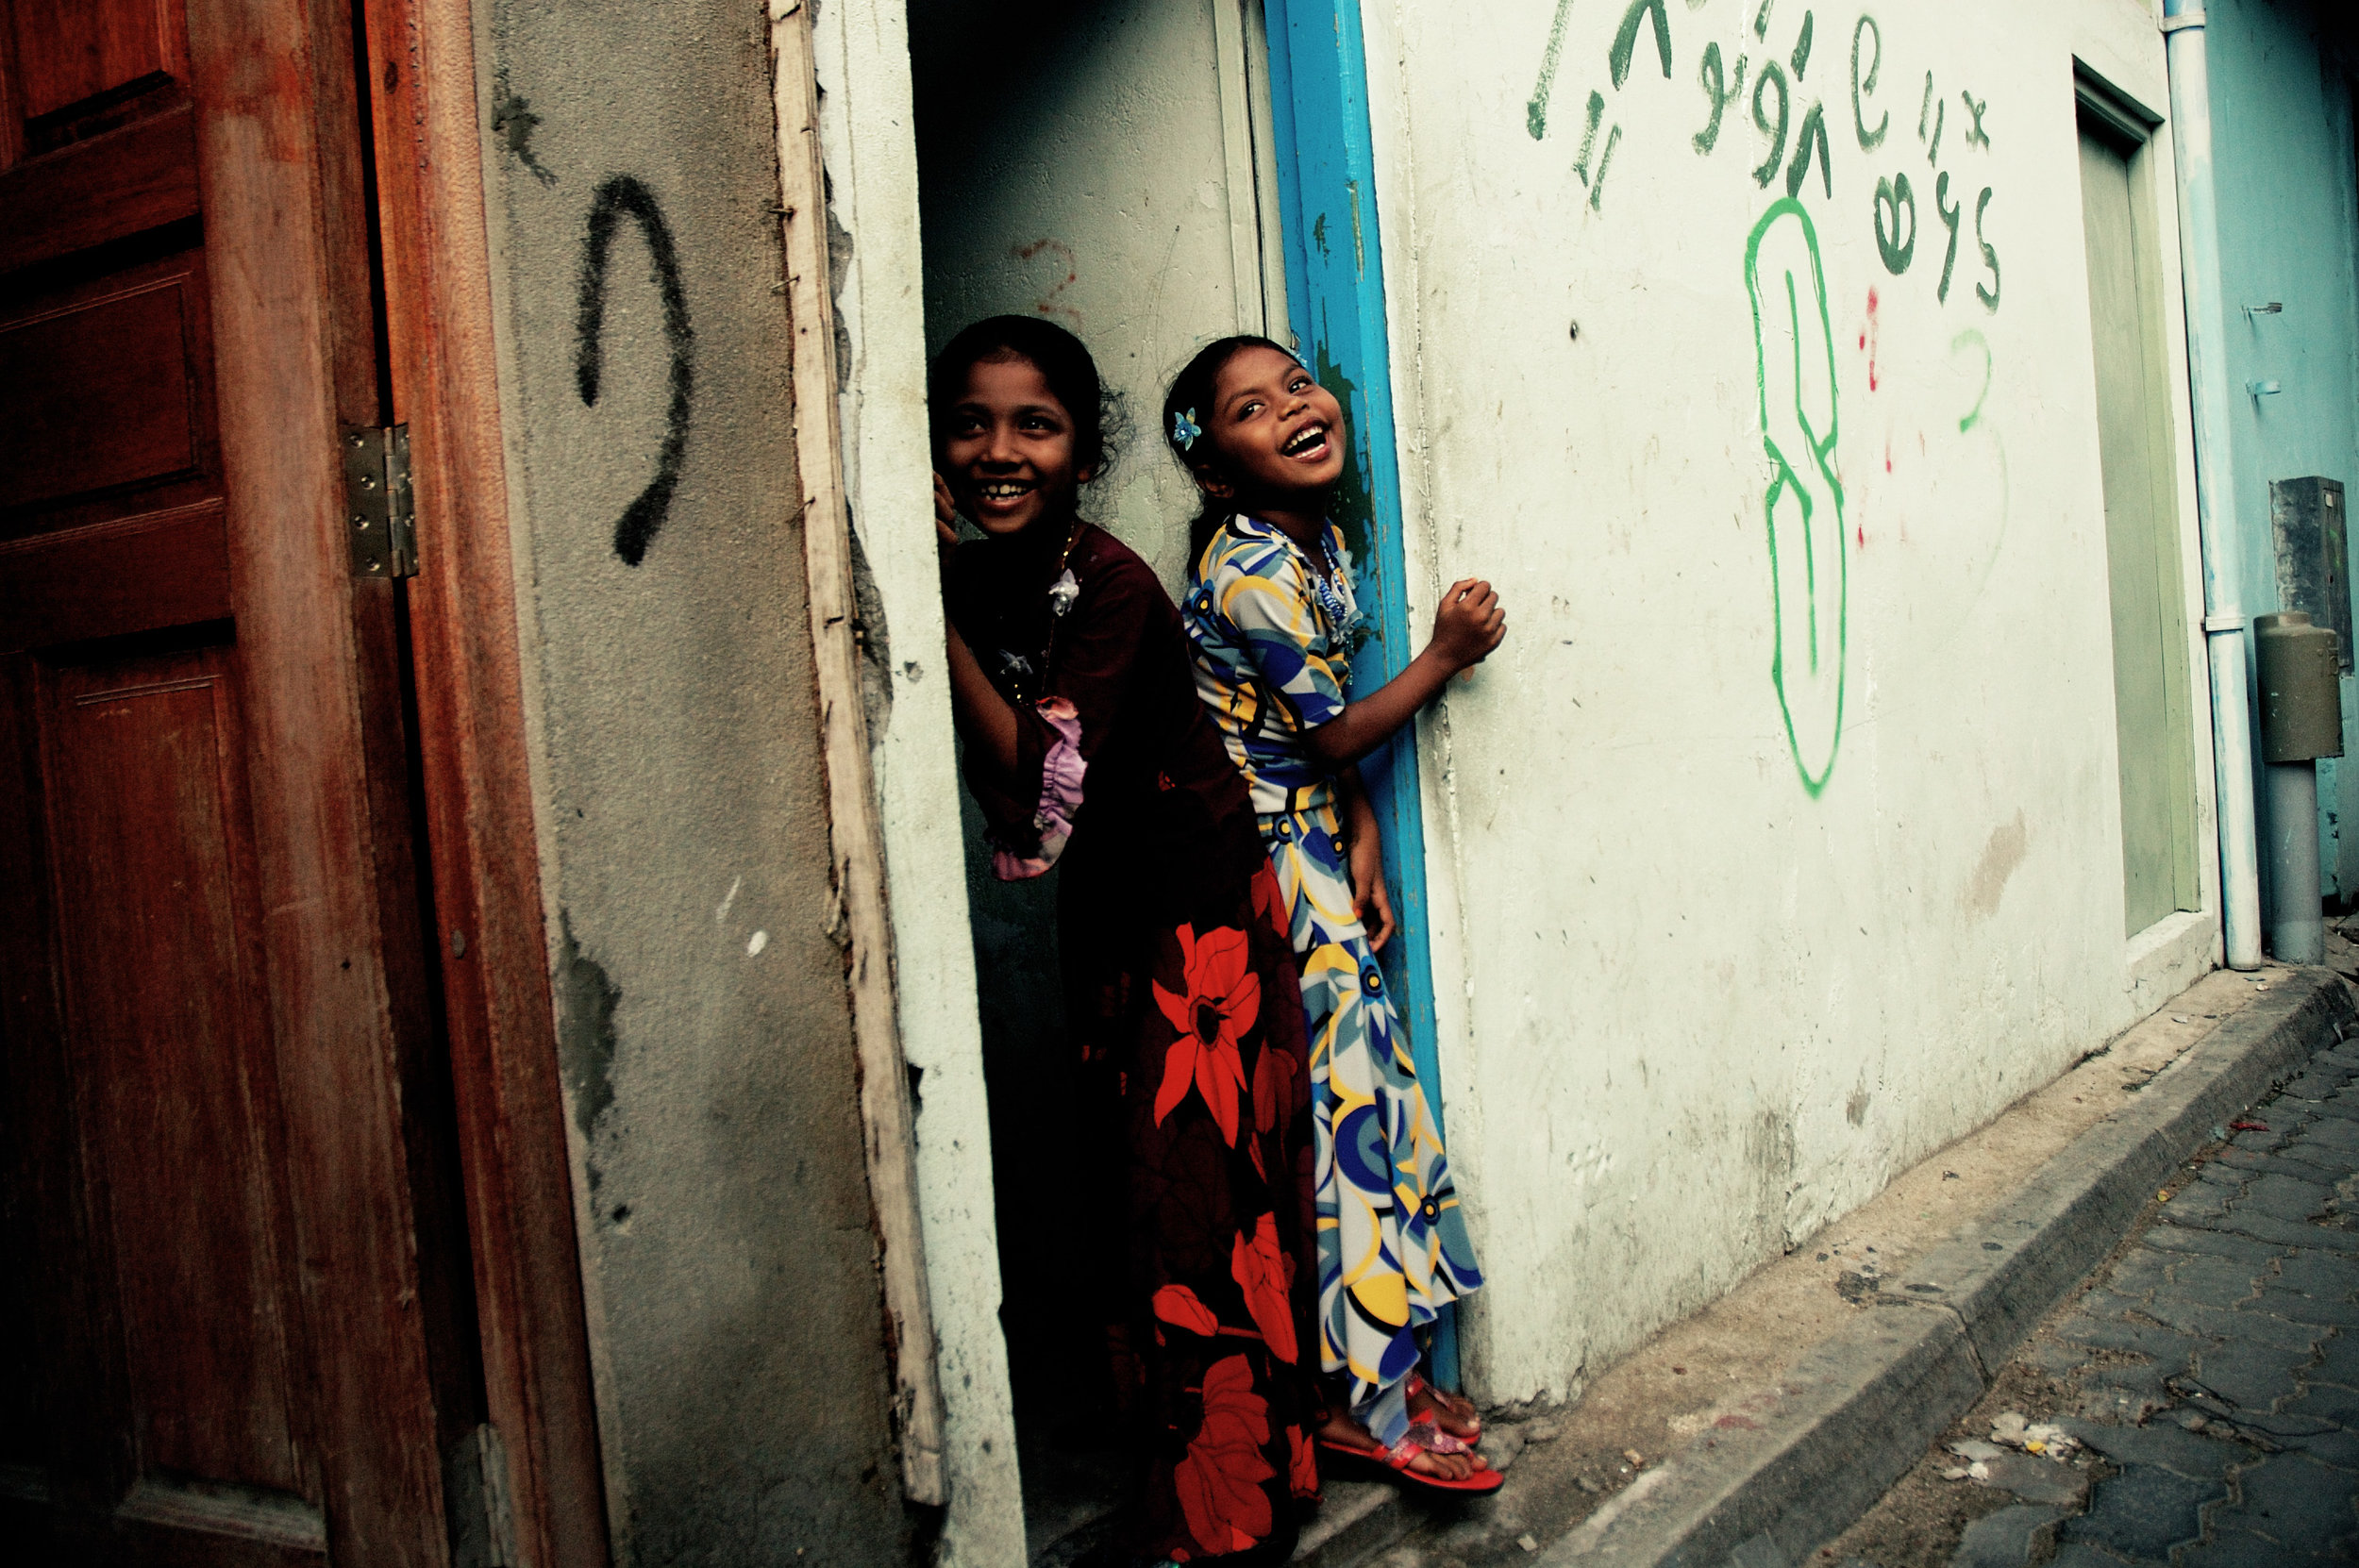 7 - Nikon D70s (2008) - Smiling Girls.jpg